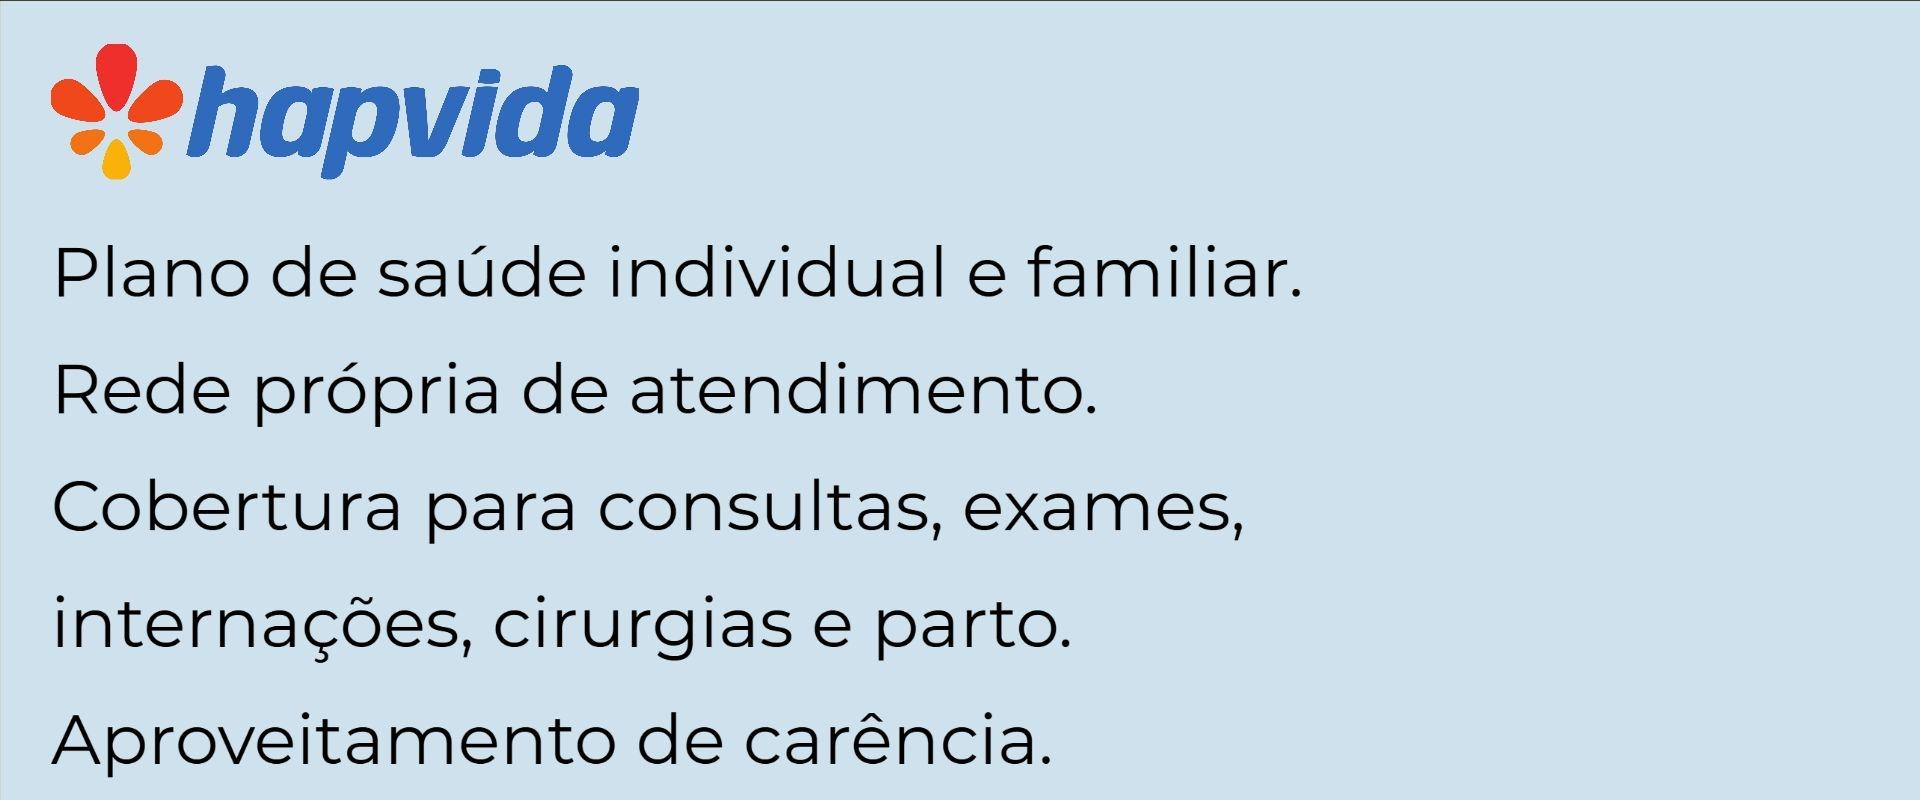 Hapvida Individual e Familiar - São Luís-MA